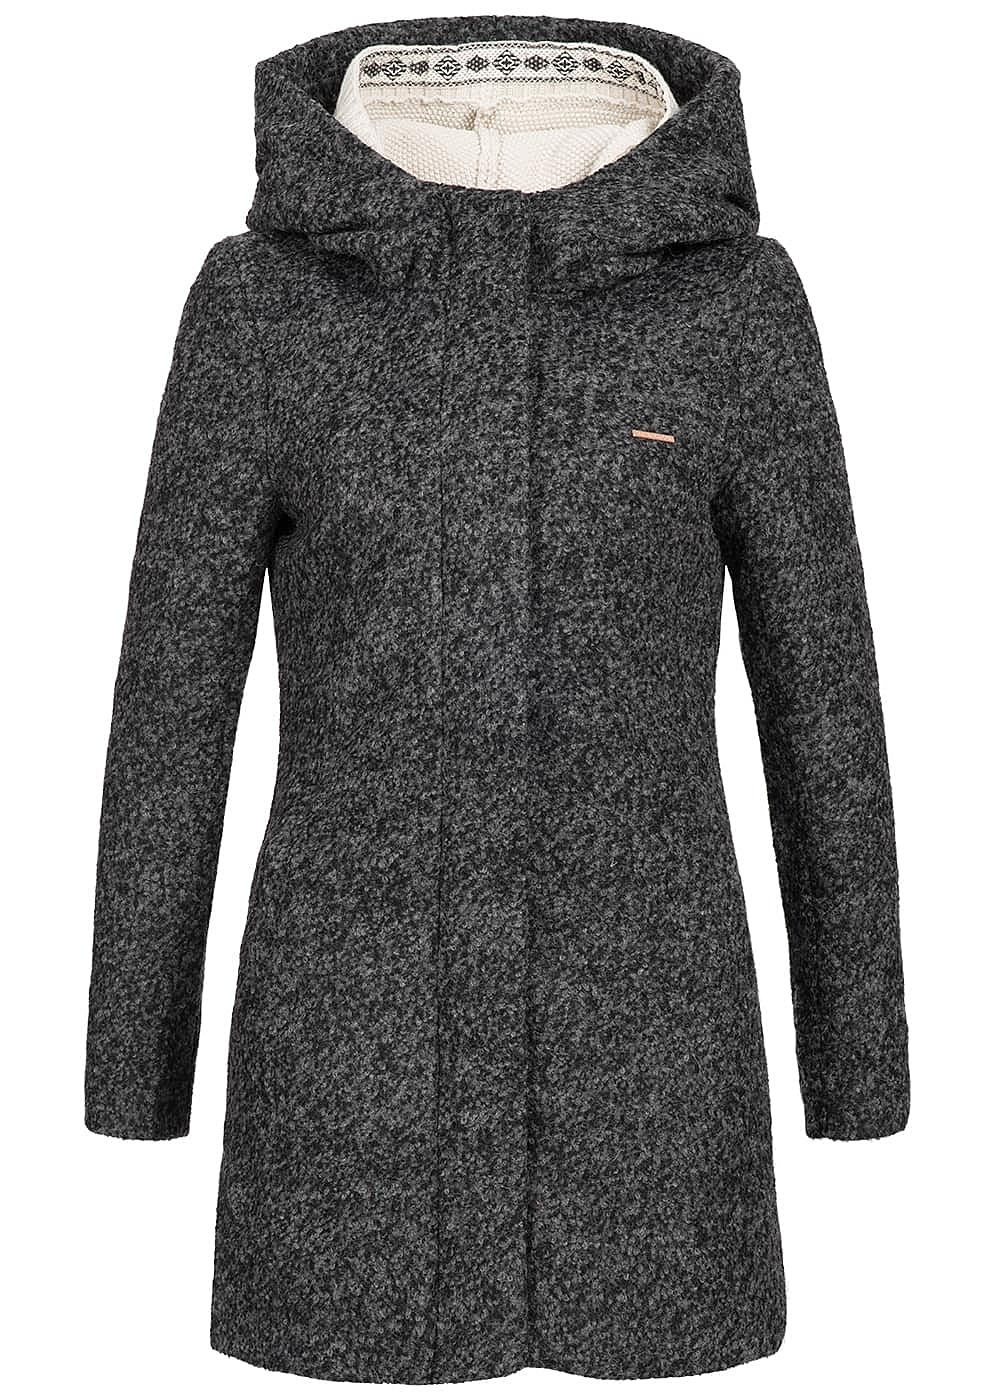 aiki damen winter mantel kapuze herausnehmbare strickweste dunkel grau 77onlineshop. Black Bedroom Furniture Sets. Home Design Ideas